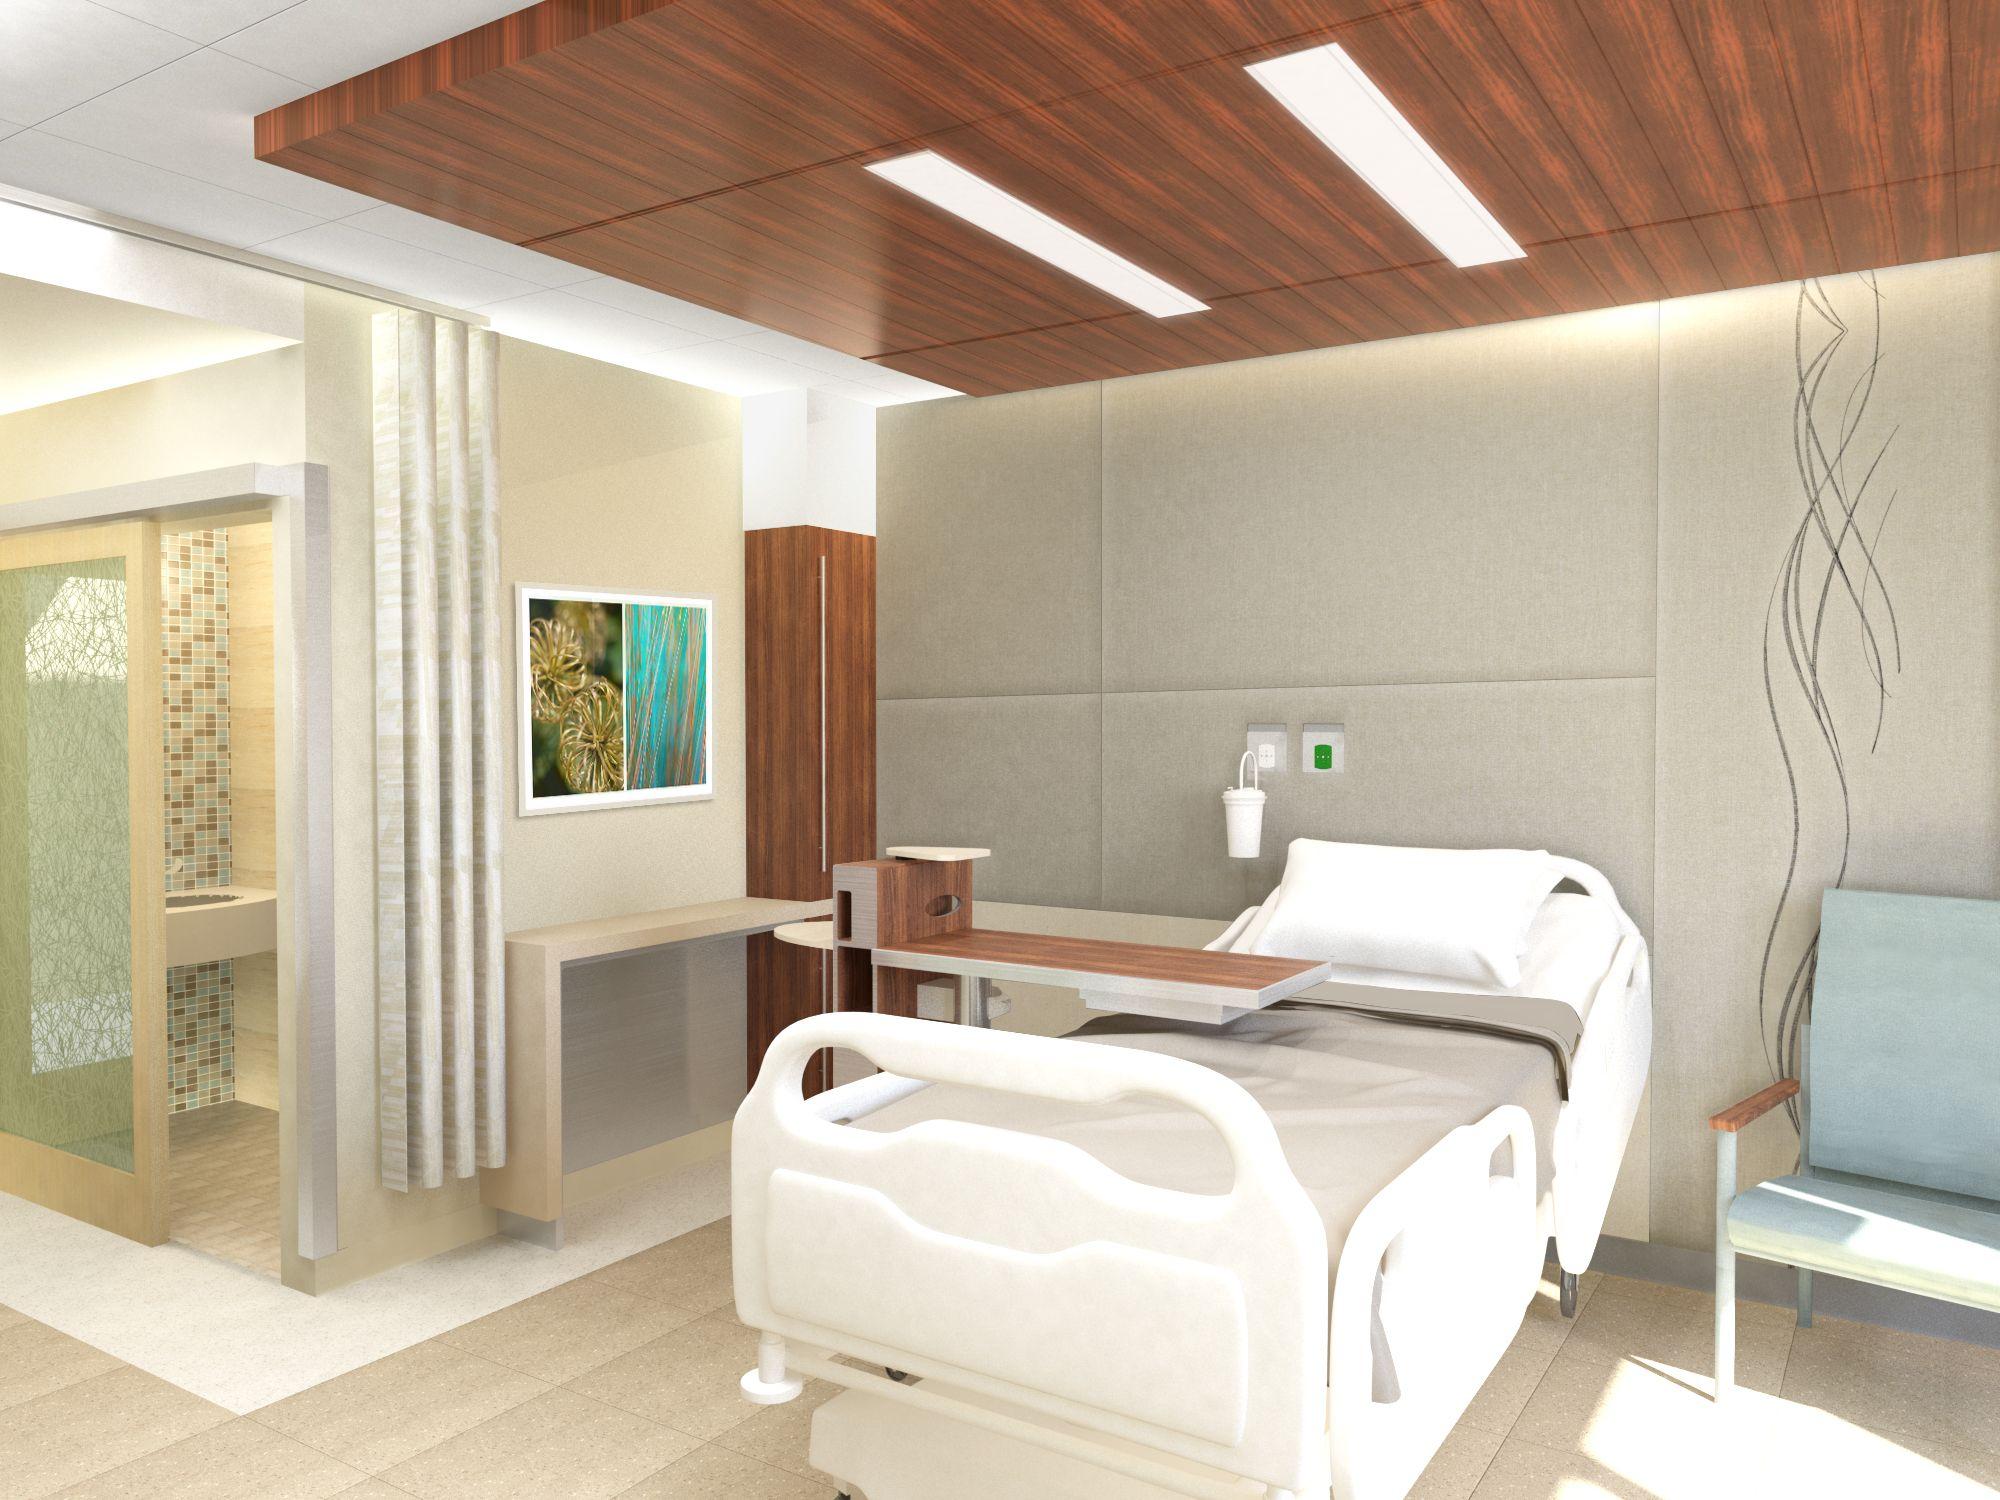 Headwall study healthcare interior design healthcare